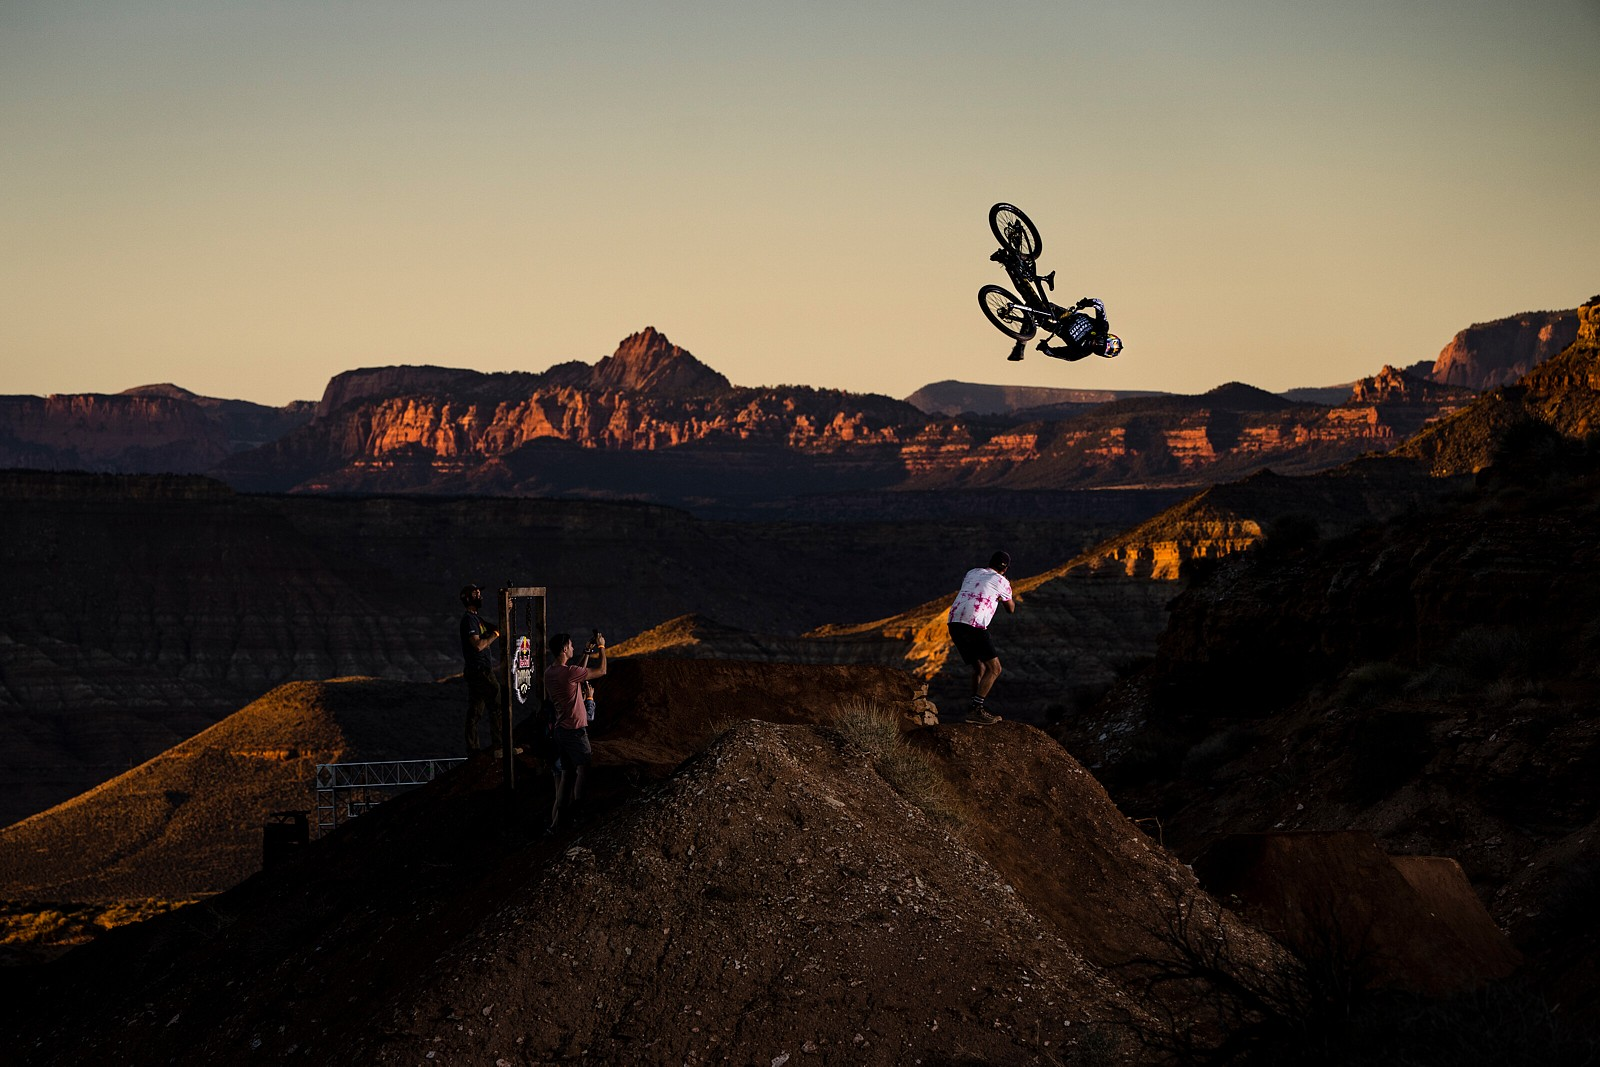 Brandon Semenuk - 2021 Red Bull Rampage Photos - Mountain Biking Pictures - Vital MTB